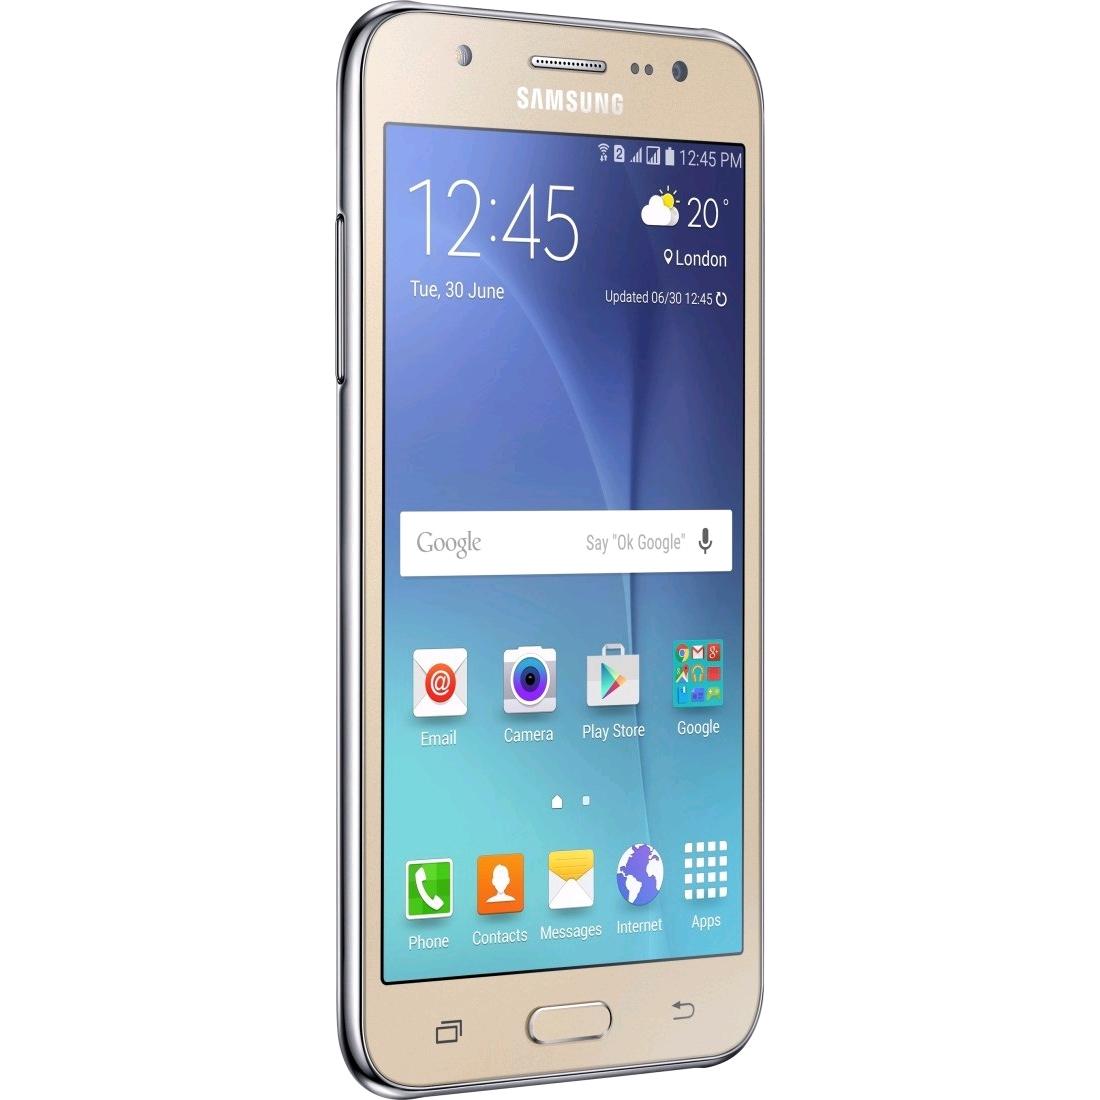 Samsung galaxy j5 dual sim ecran 5 pouces for Photo ecran samsung j5